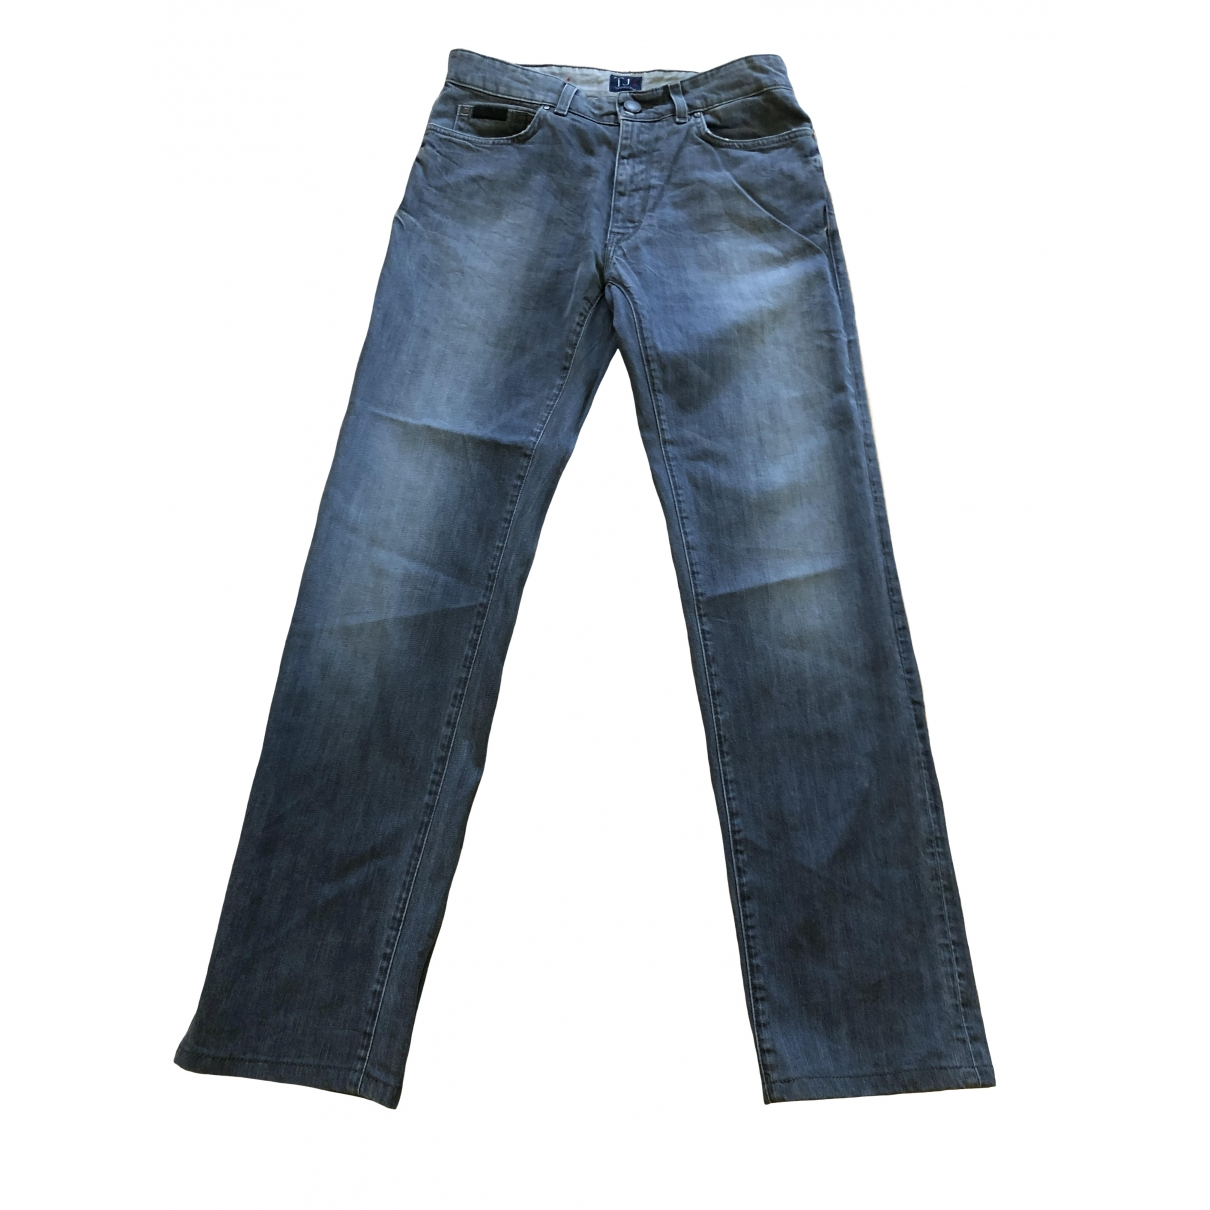 Trussardi Jeans \N Grey Cotton - elasthane Jeans for Men 32 US